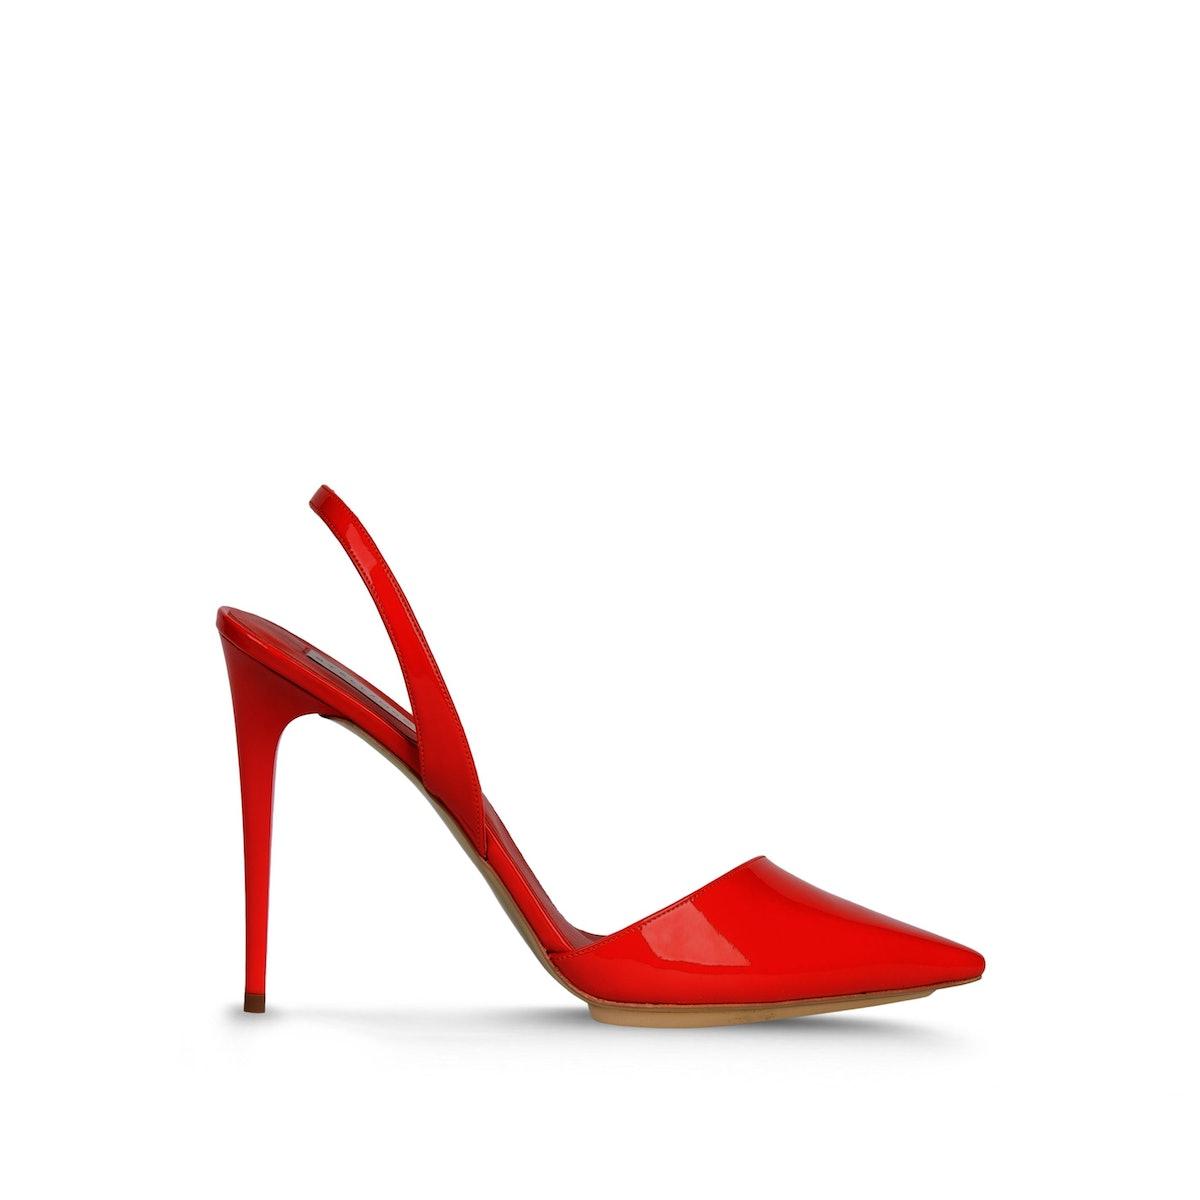 Stella McCartney heels, $695, stellamccartney.com